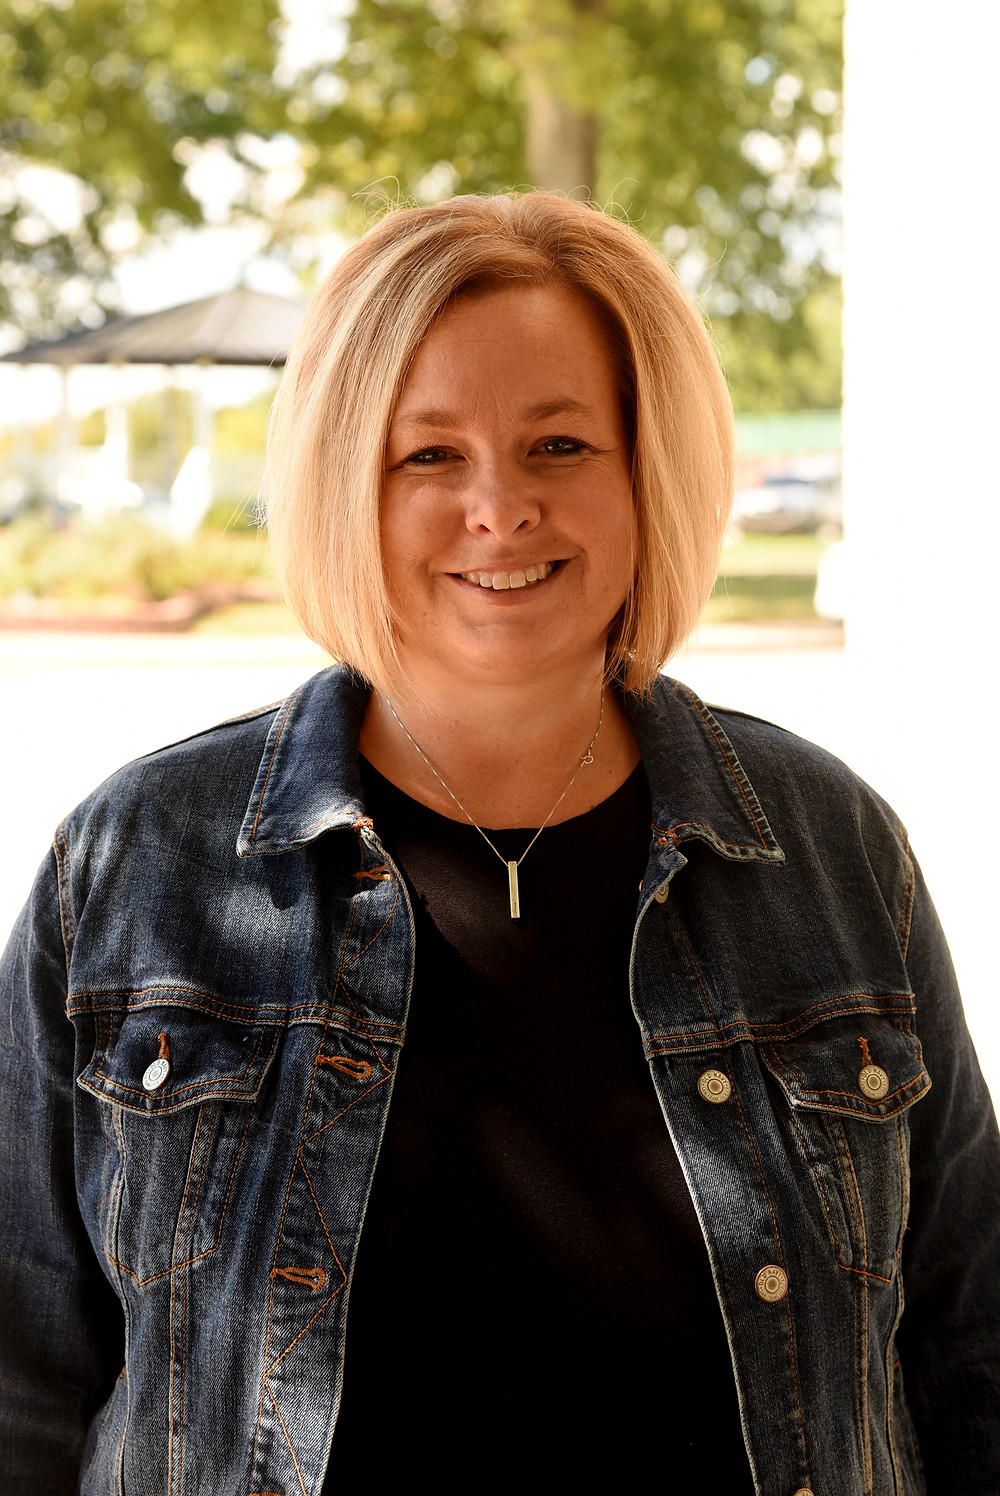 City of Charlestown Community Liaison Courtney Rodewig